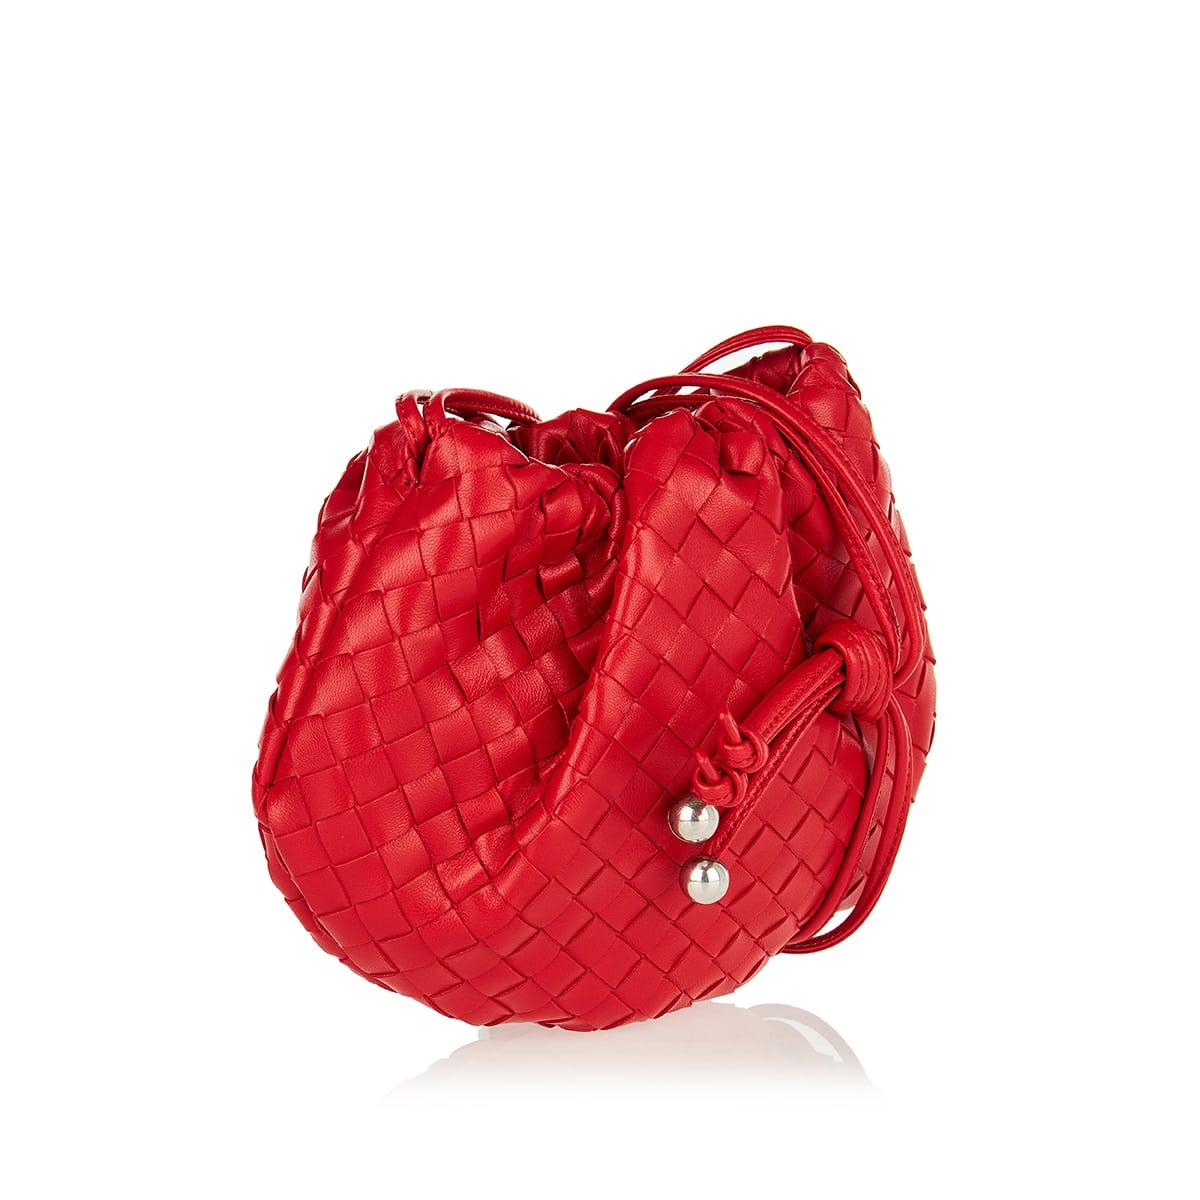 The Mini Bulb lntrecciato leather bag